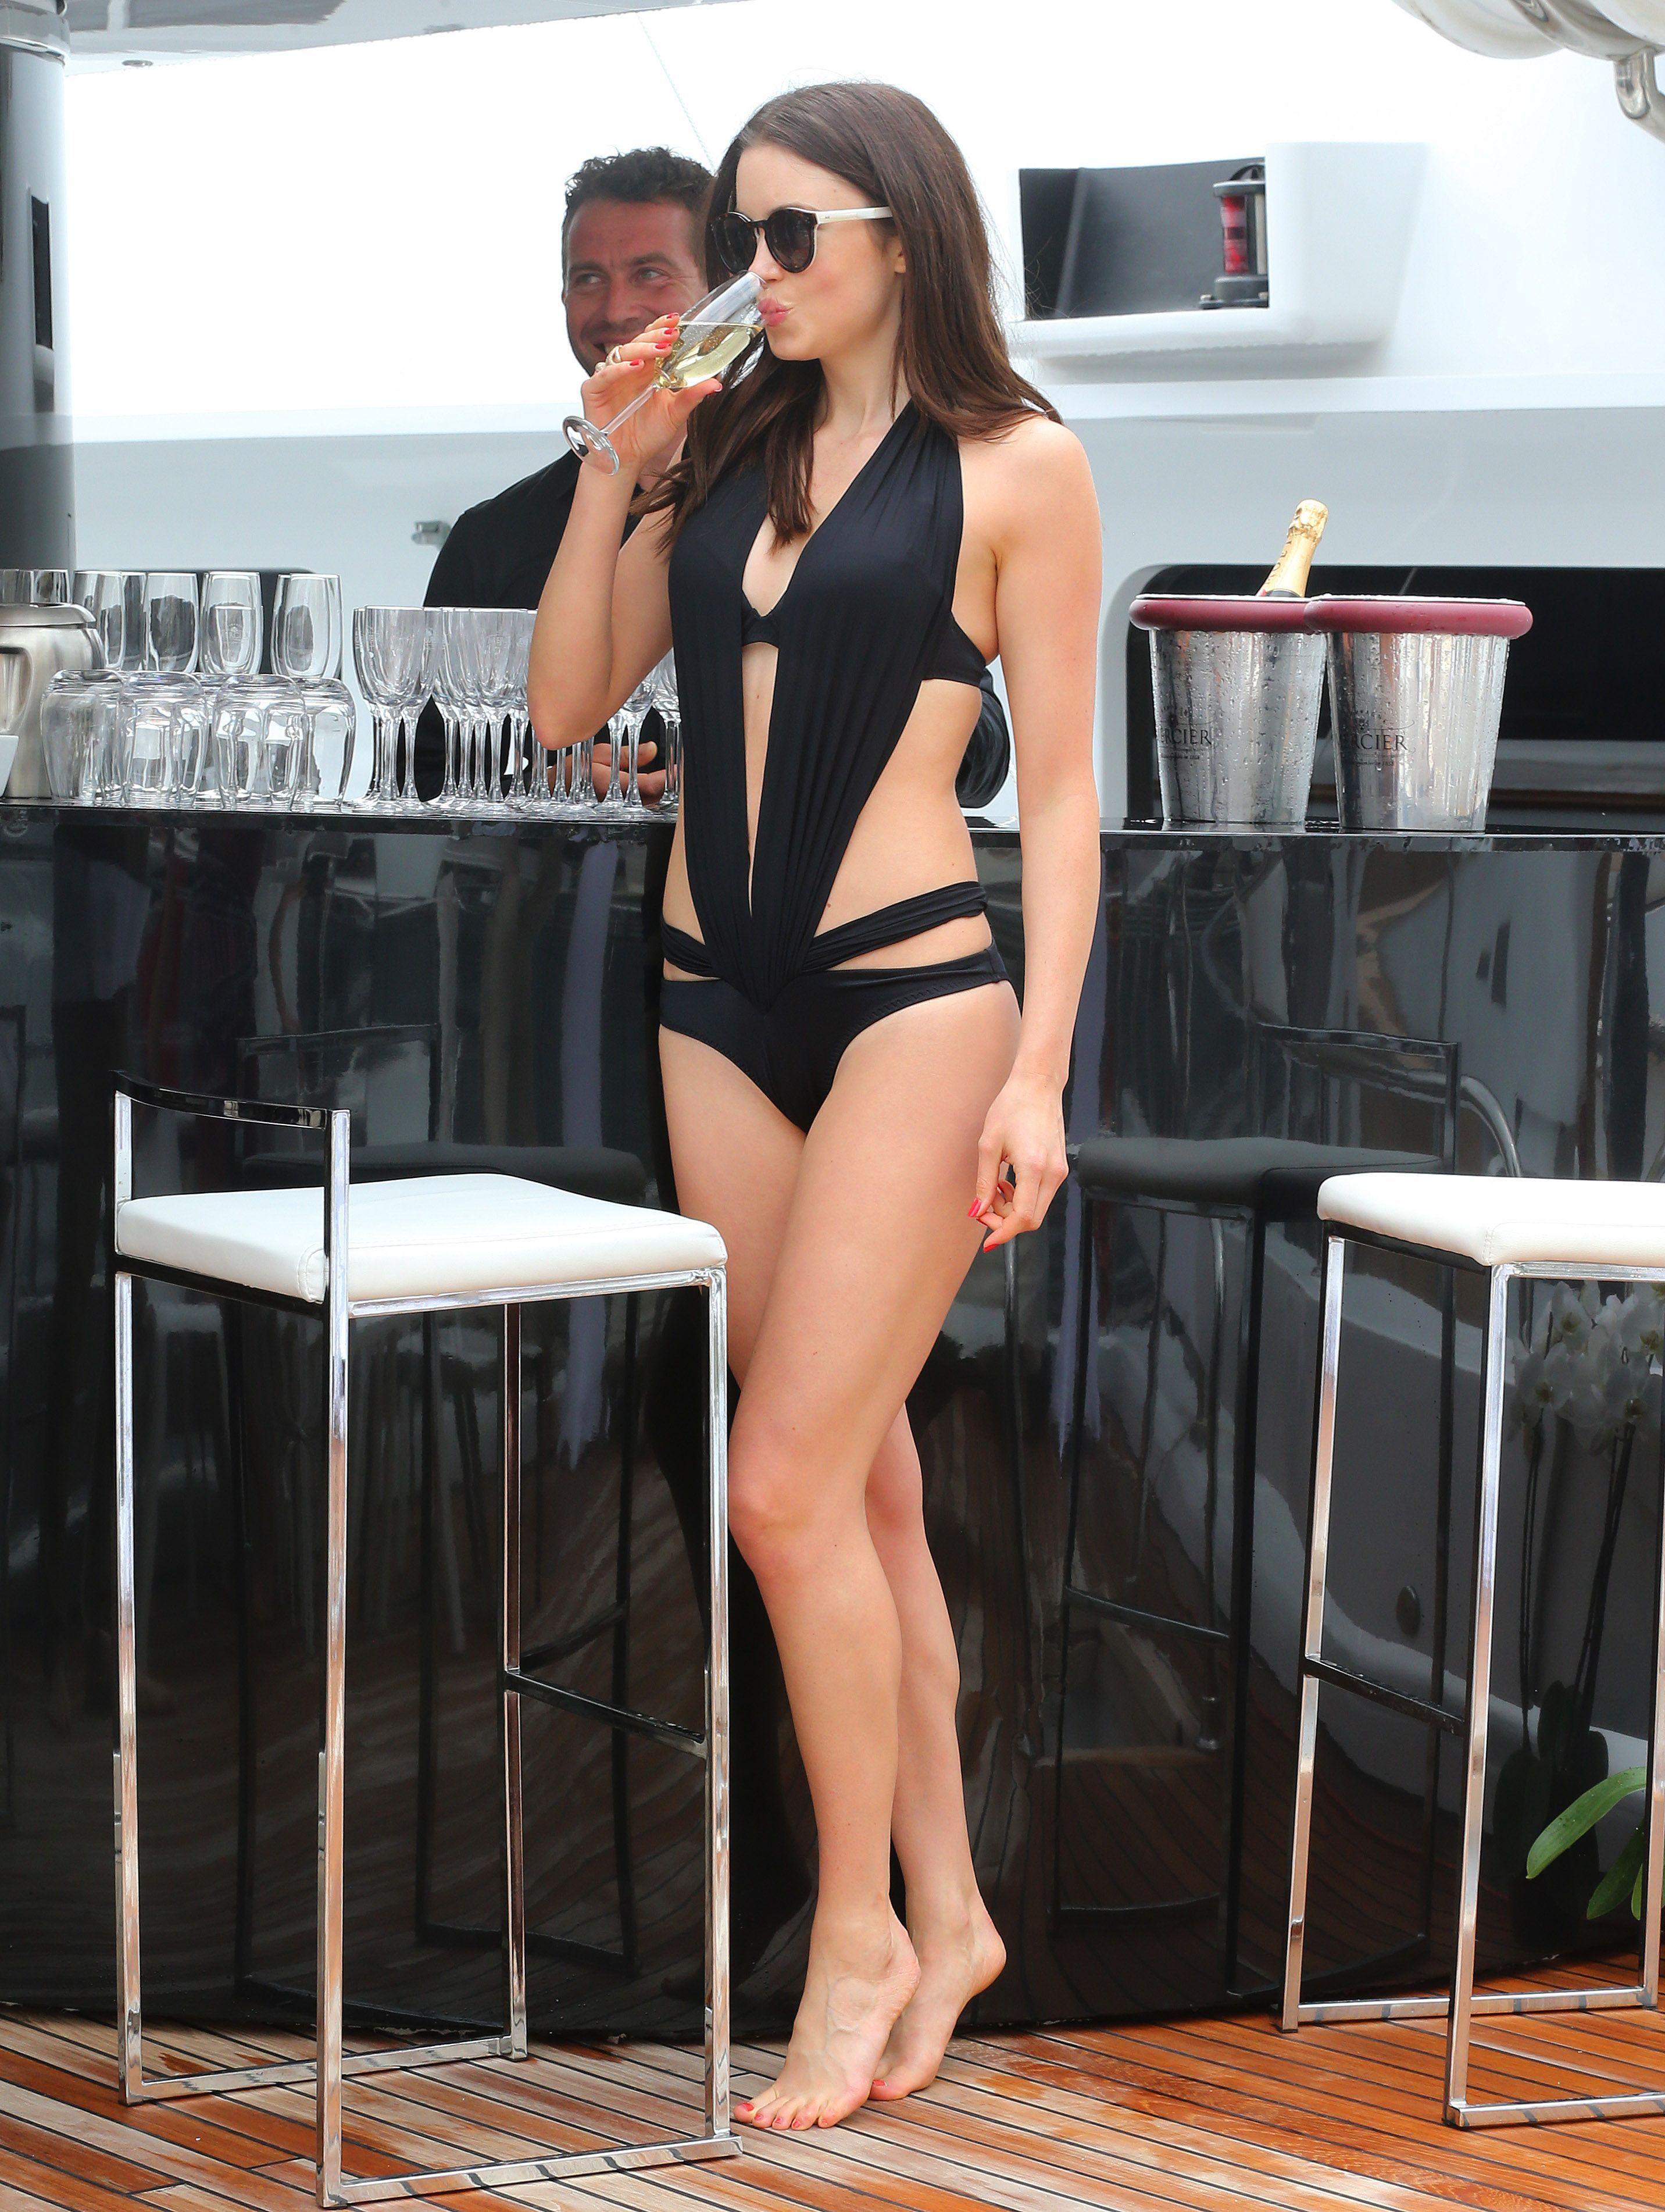 Feet Emma Miller naked (23 photos), Topless, Cleavage, Feet, panties 2019